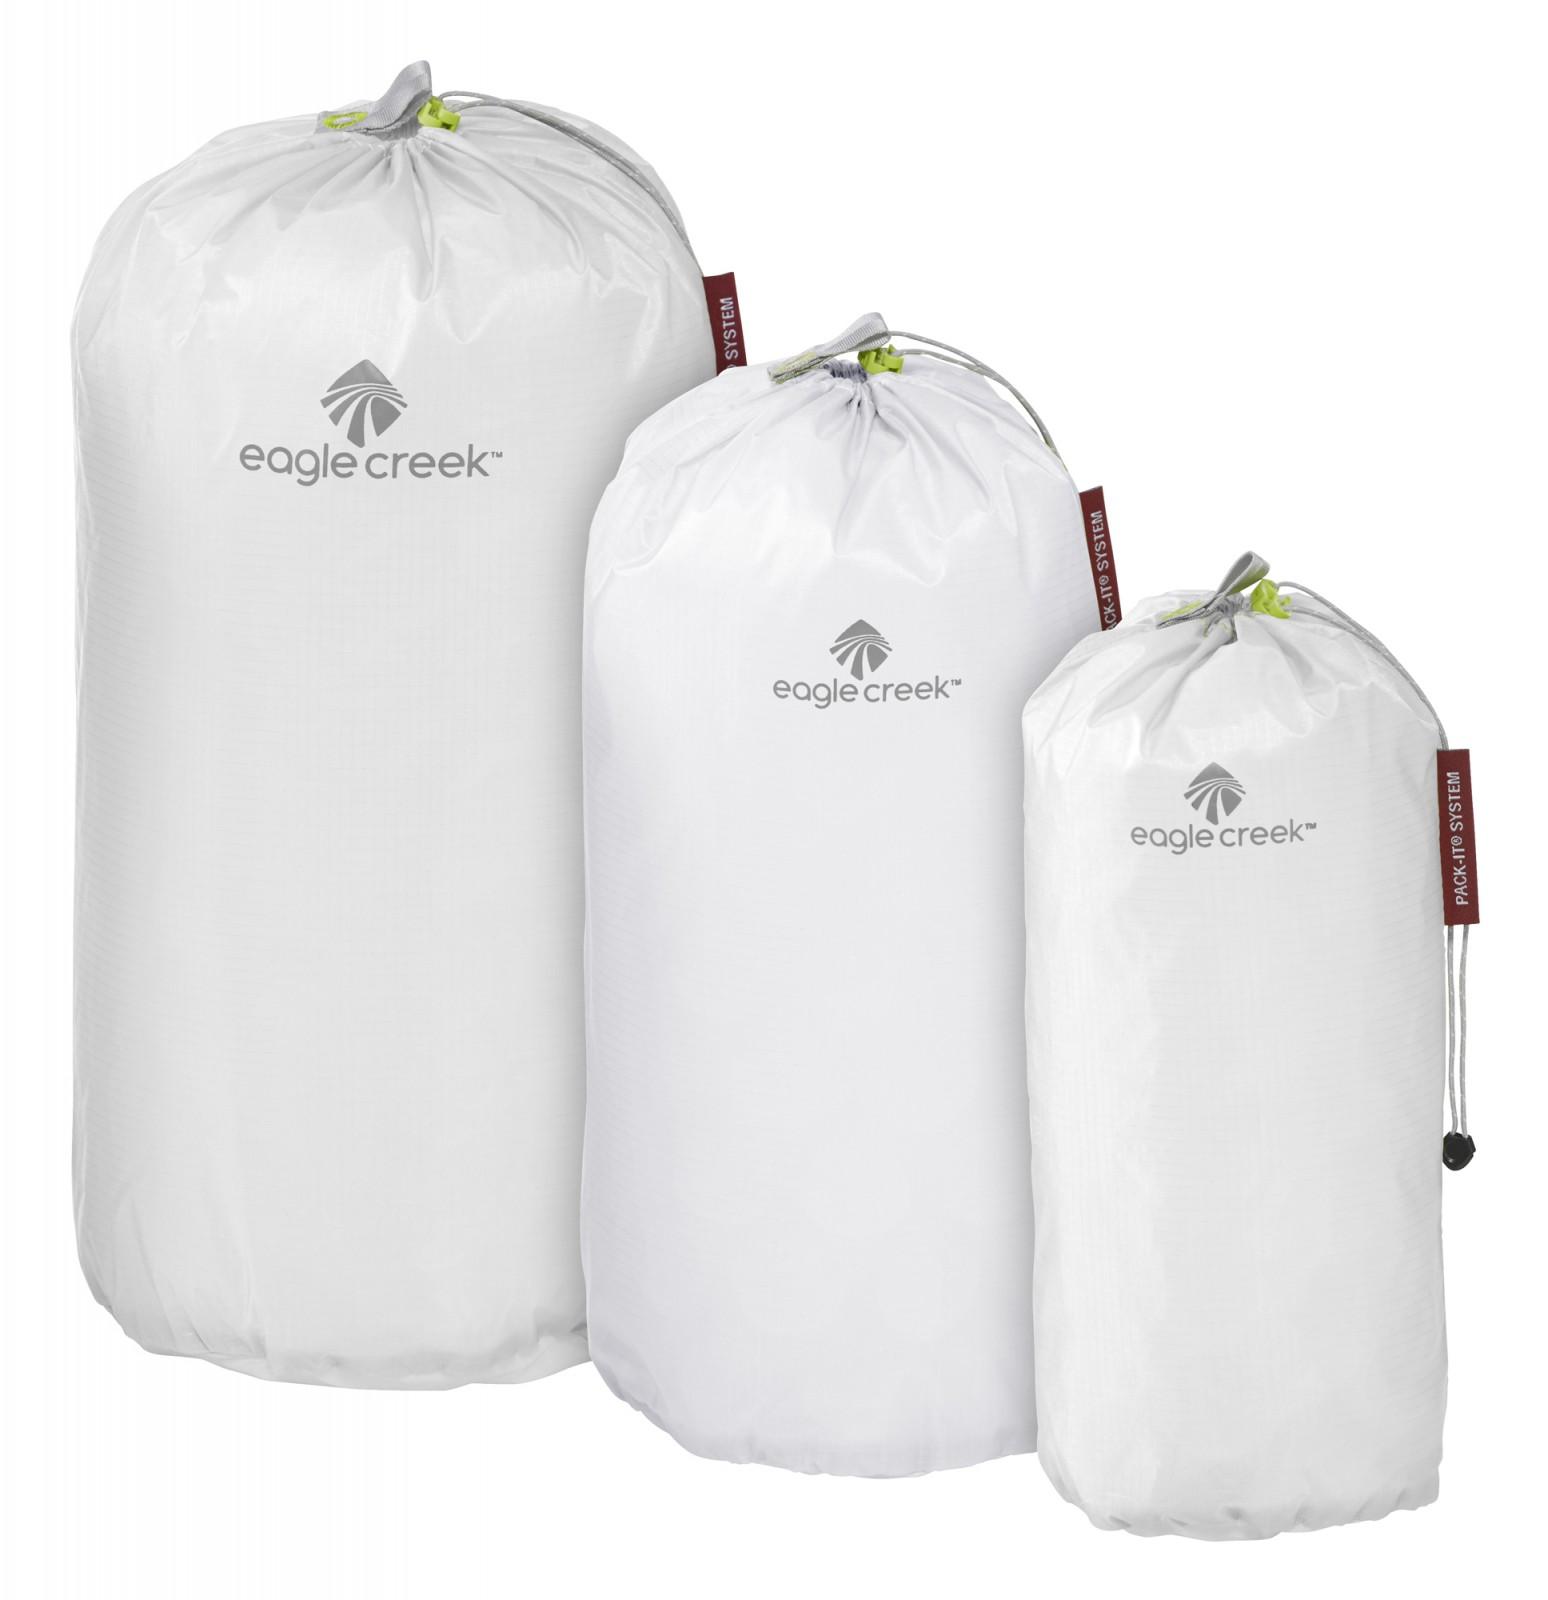 eagle creek Pack-It Specter Stuffer Set S / M / L White / Strobe